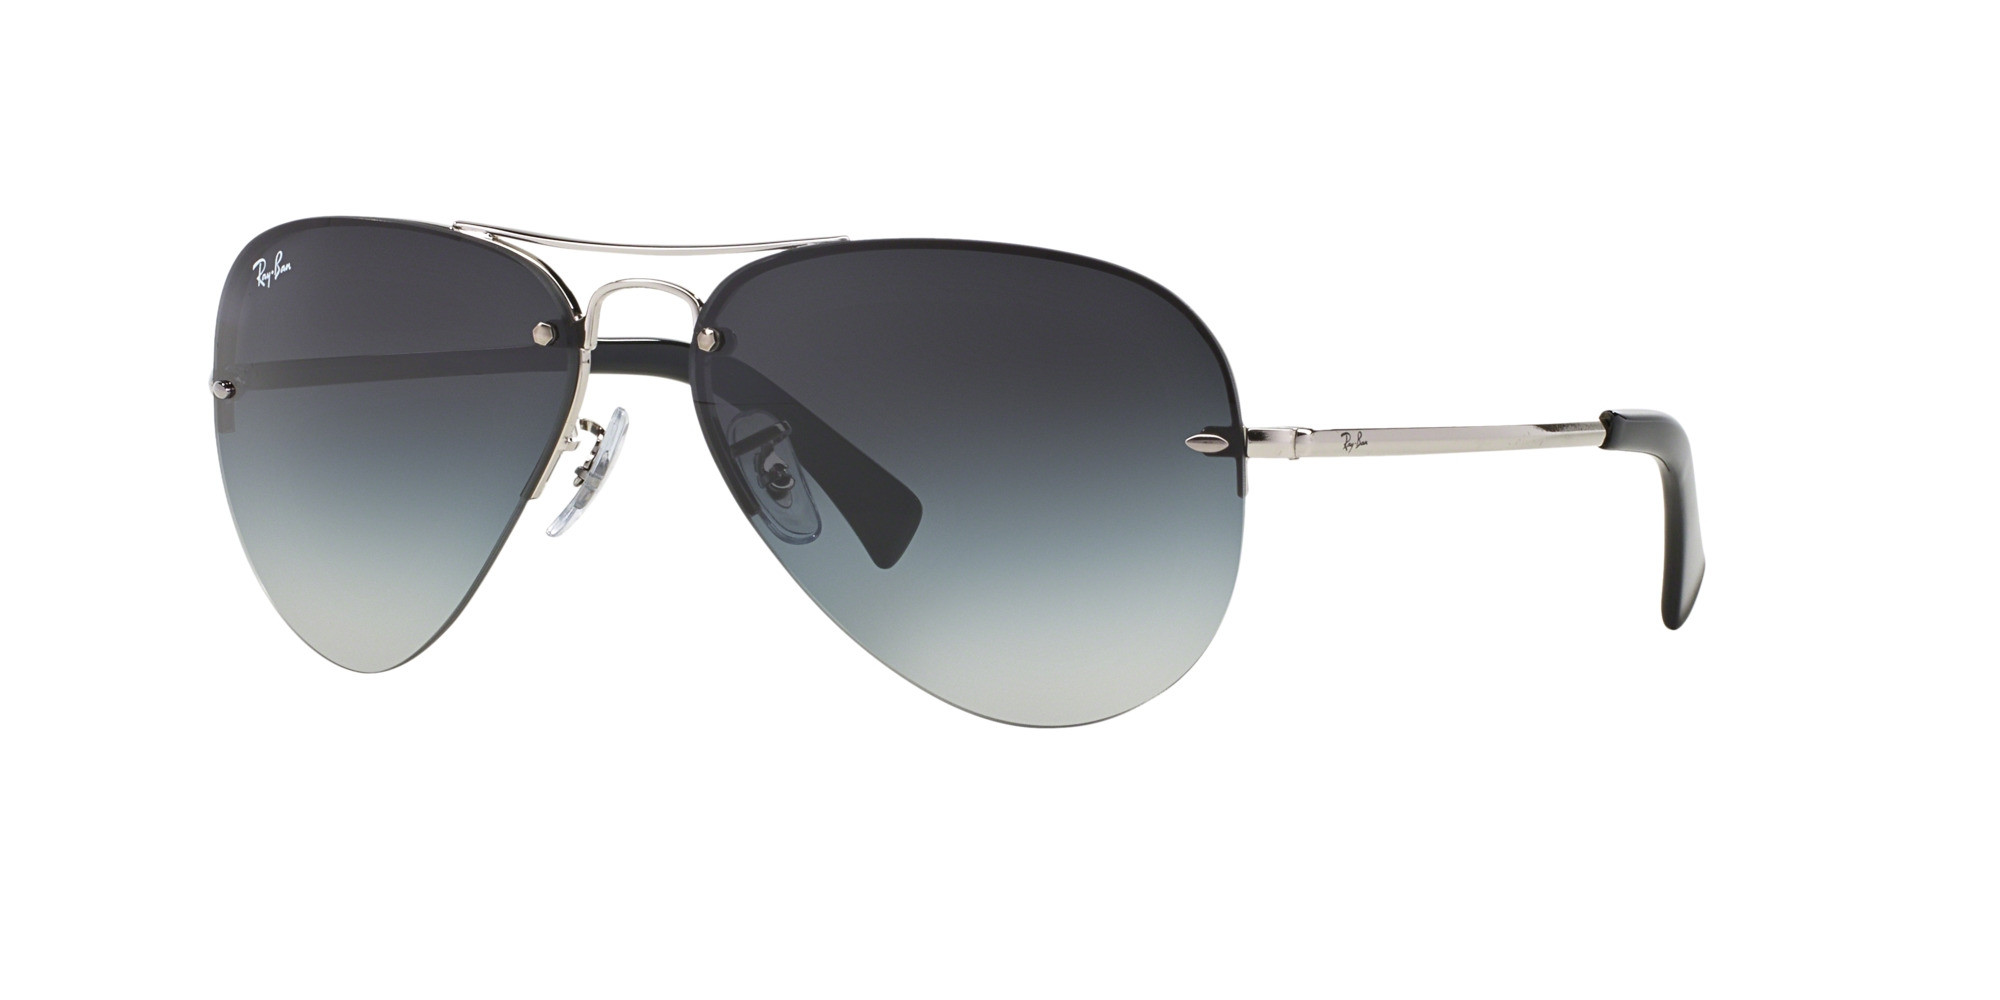 Gafas de sol RAY-BAN AVIATOR RB 3449 003/8G